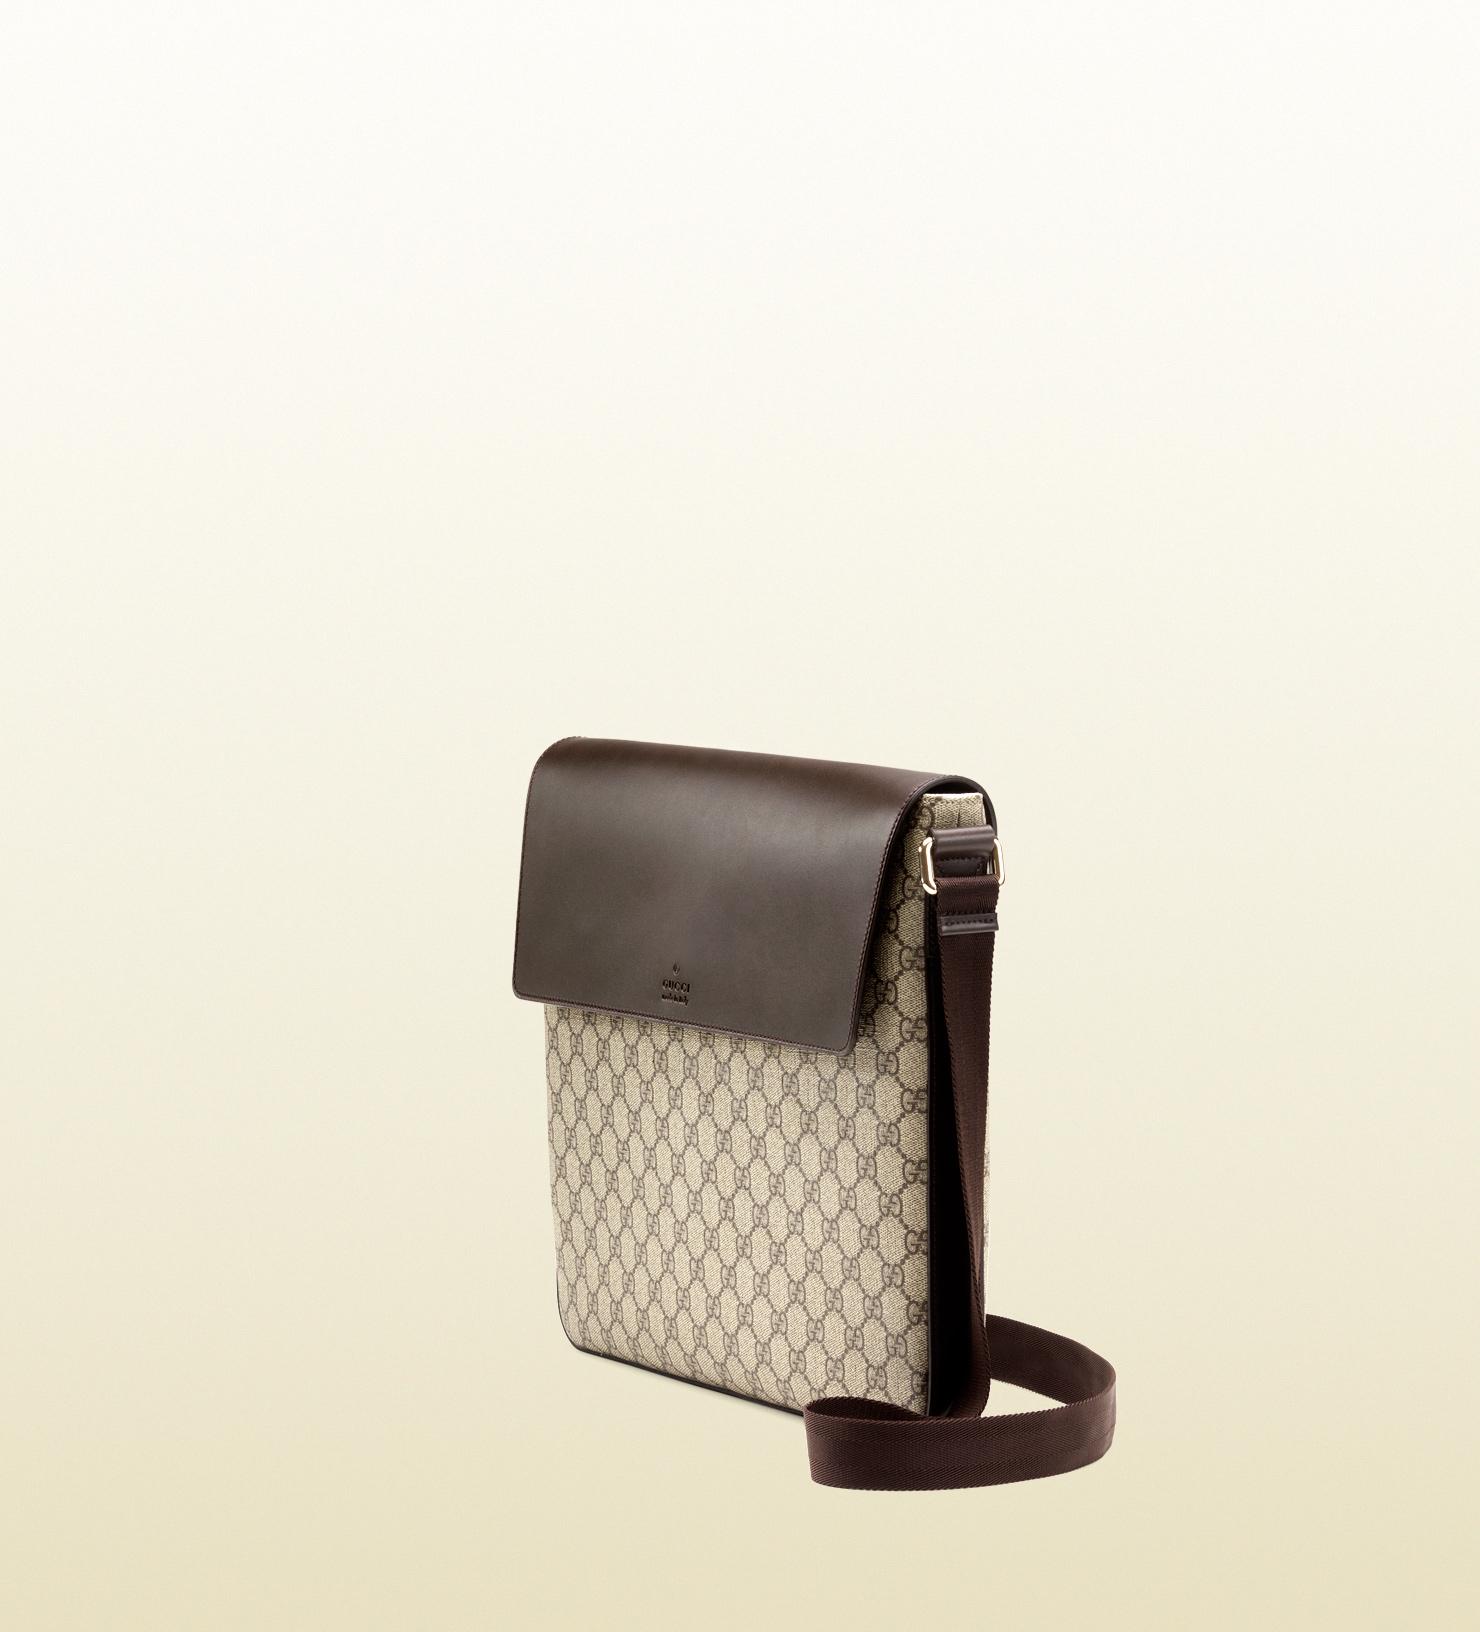 72b3cecd61831 Gucci Gg Supreme Canvas Messenger Bag in Black for Men - Lyst